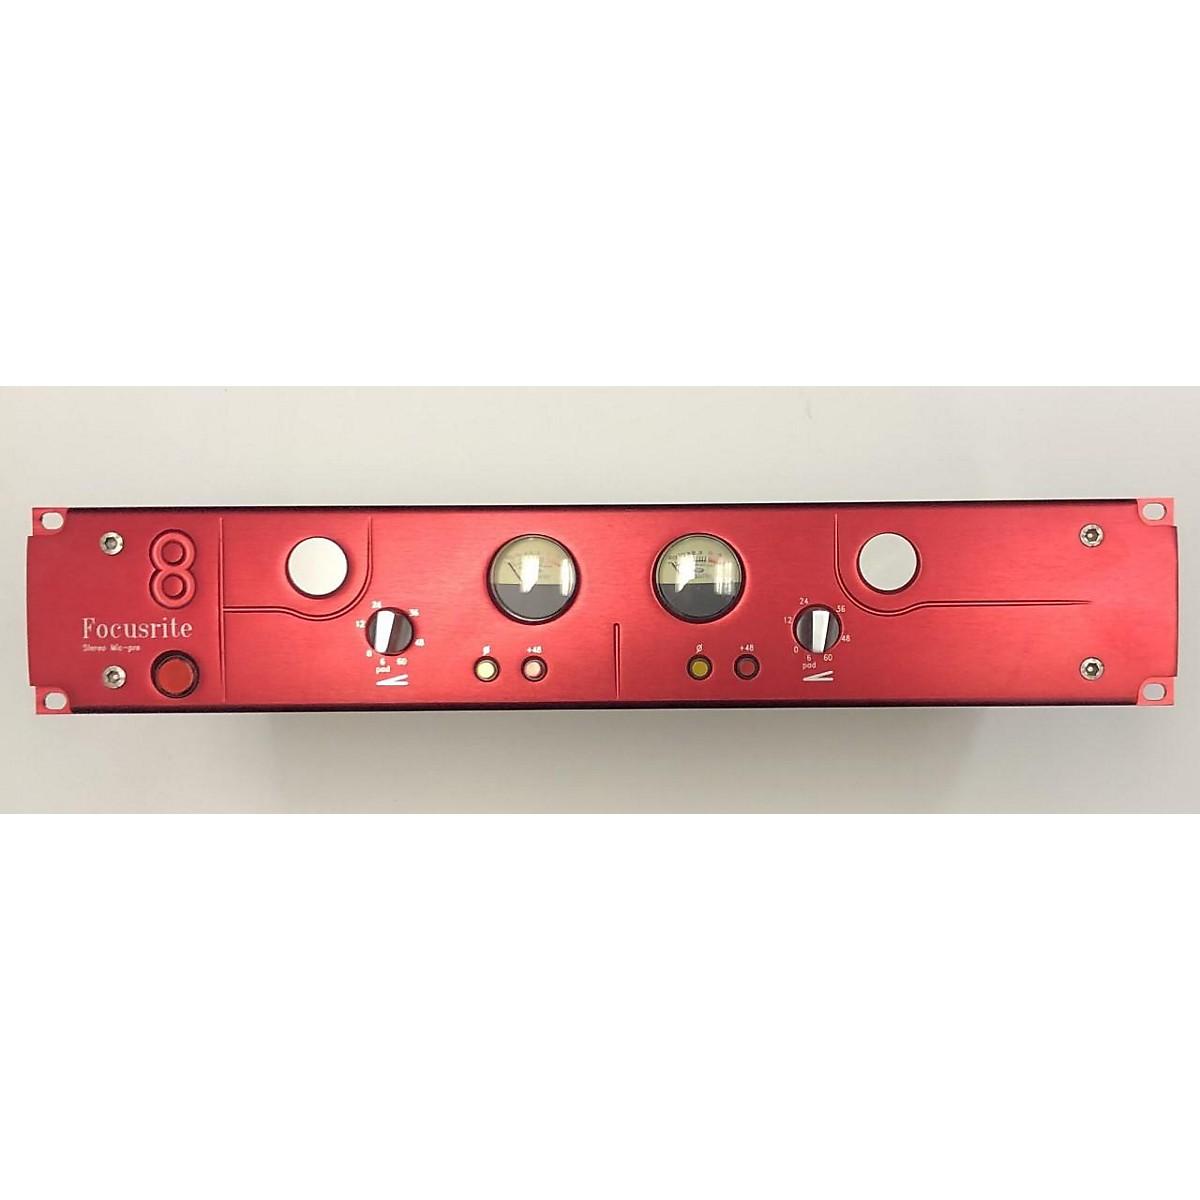 Focusrite RED 8 Audio Interface